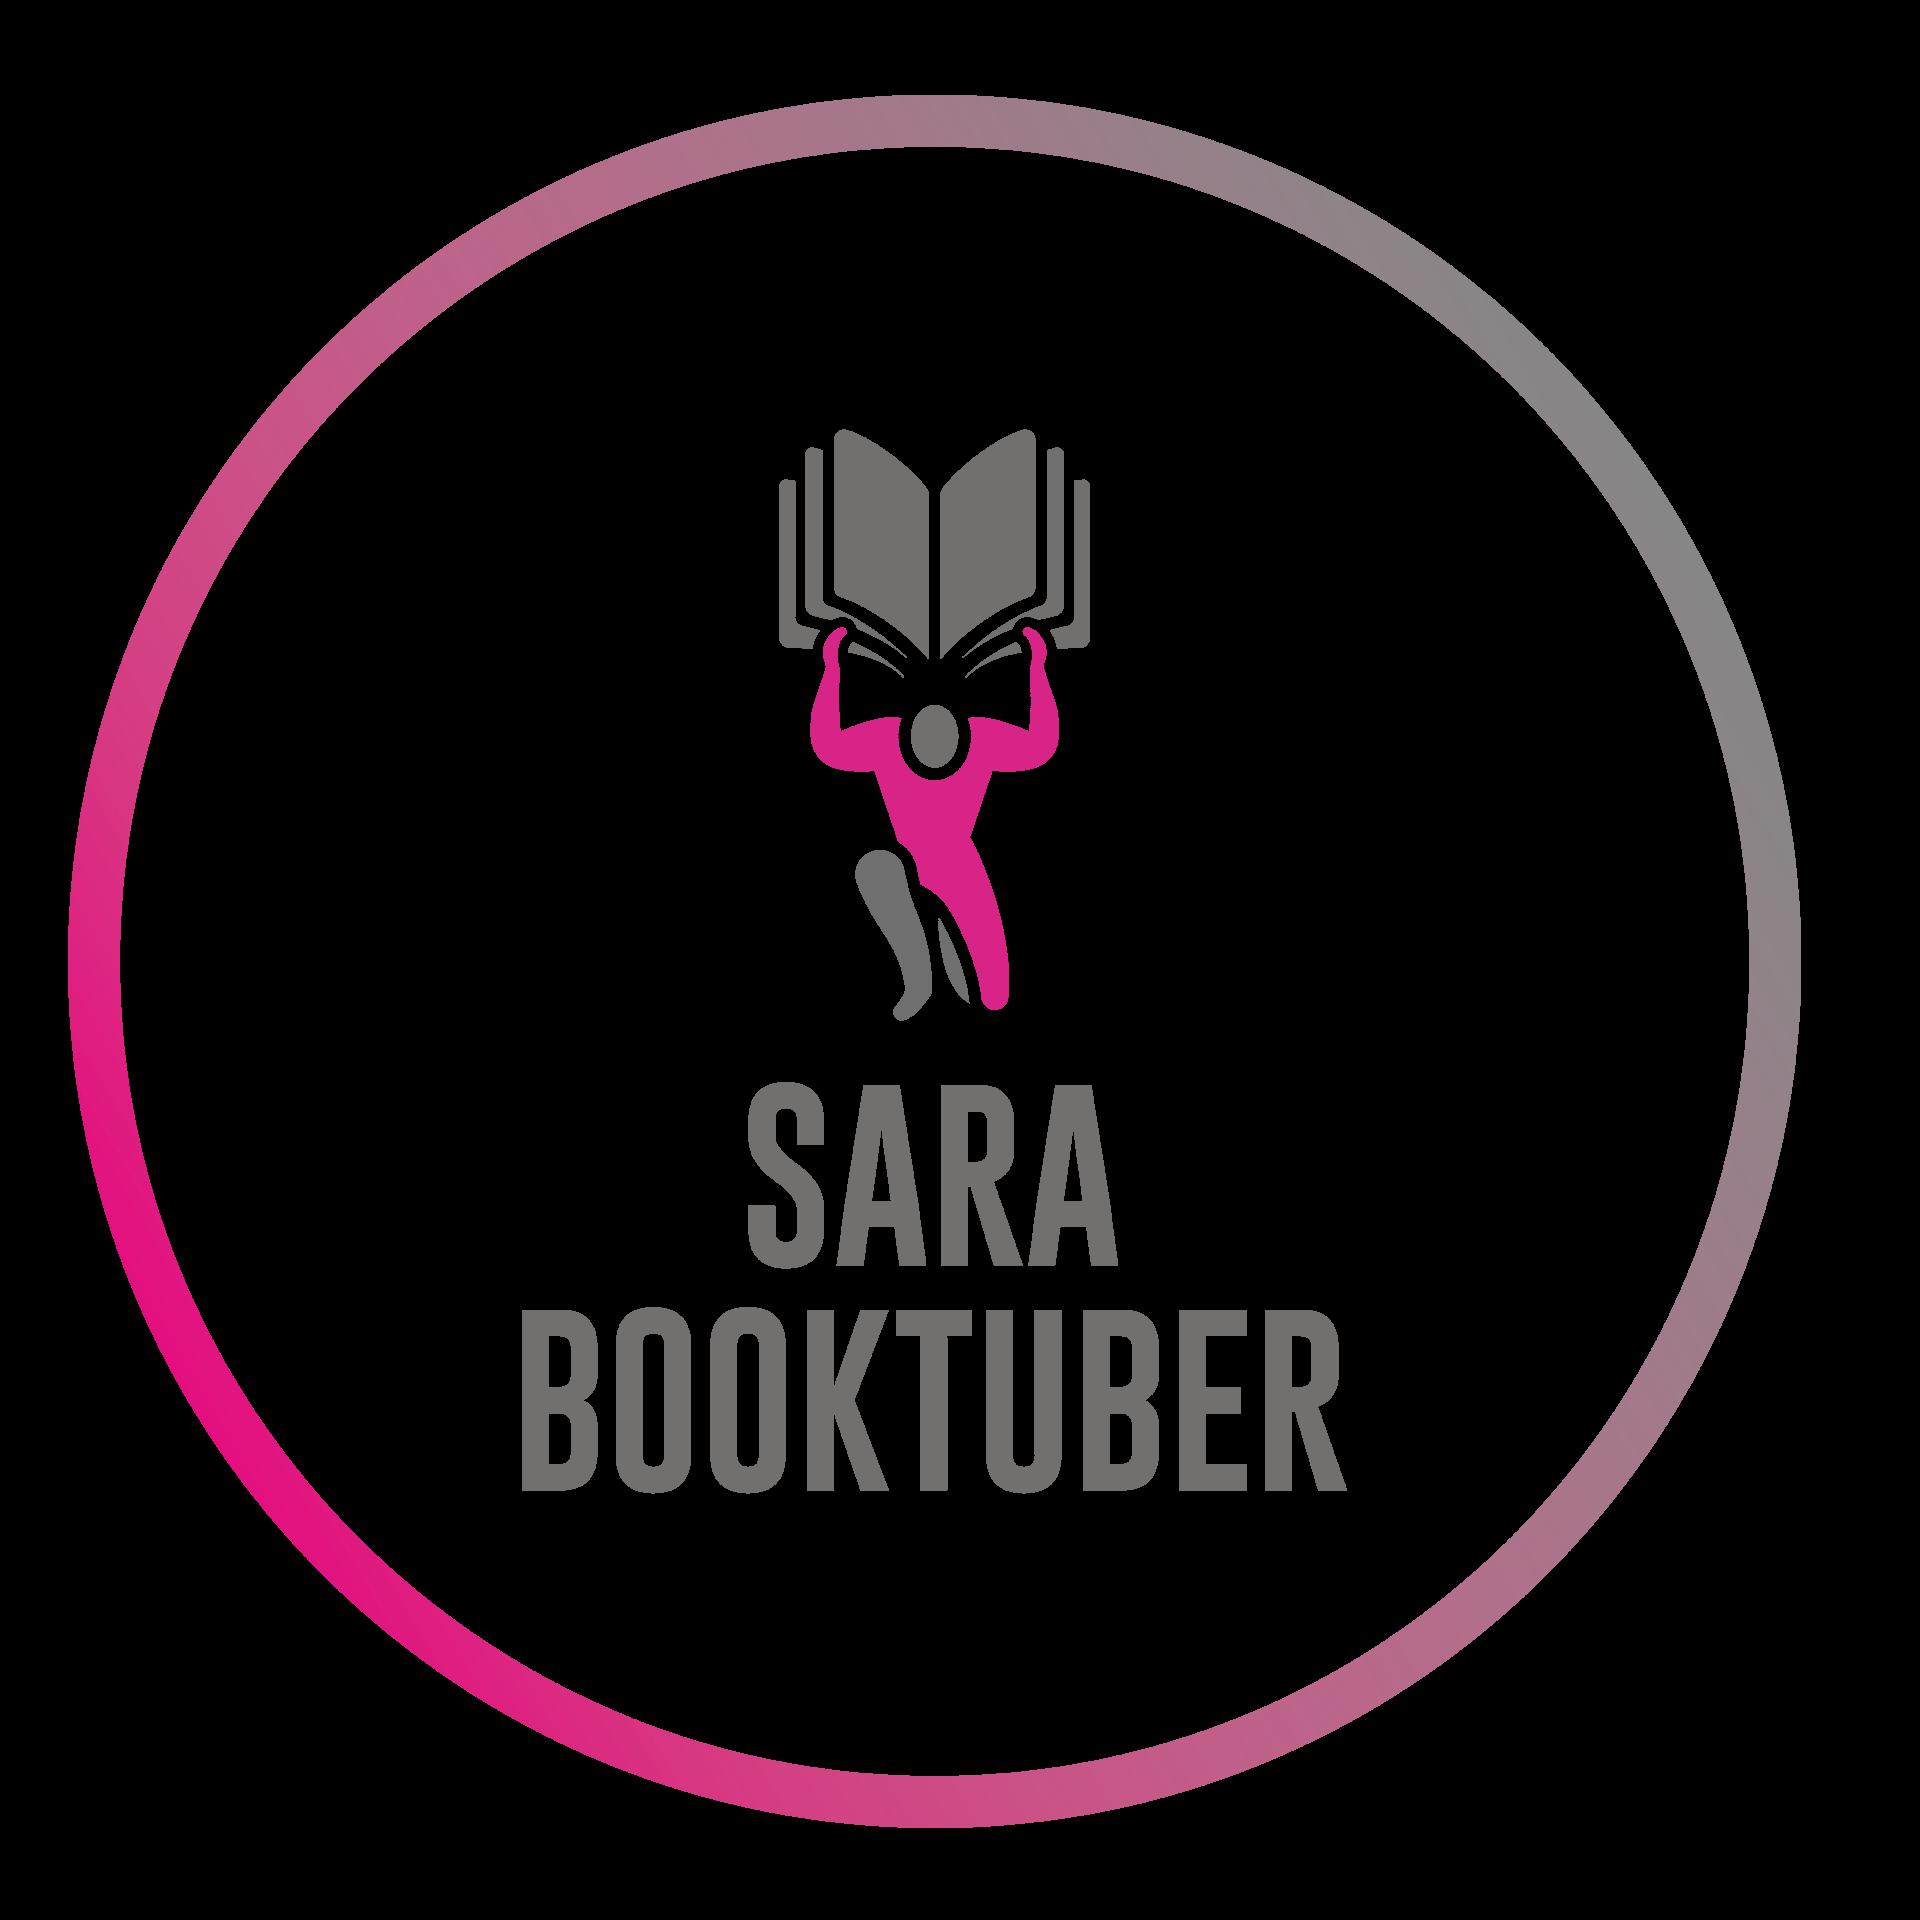 Sara Booktuber